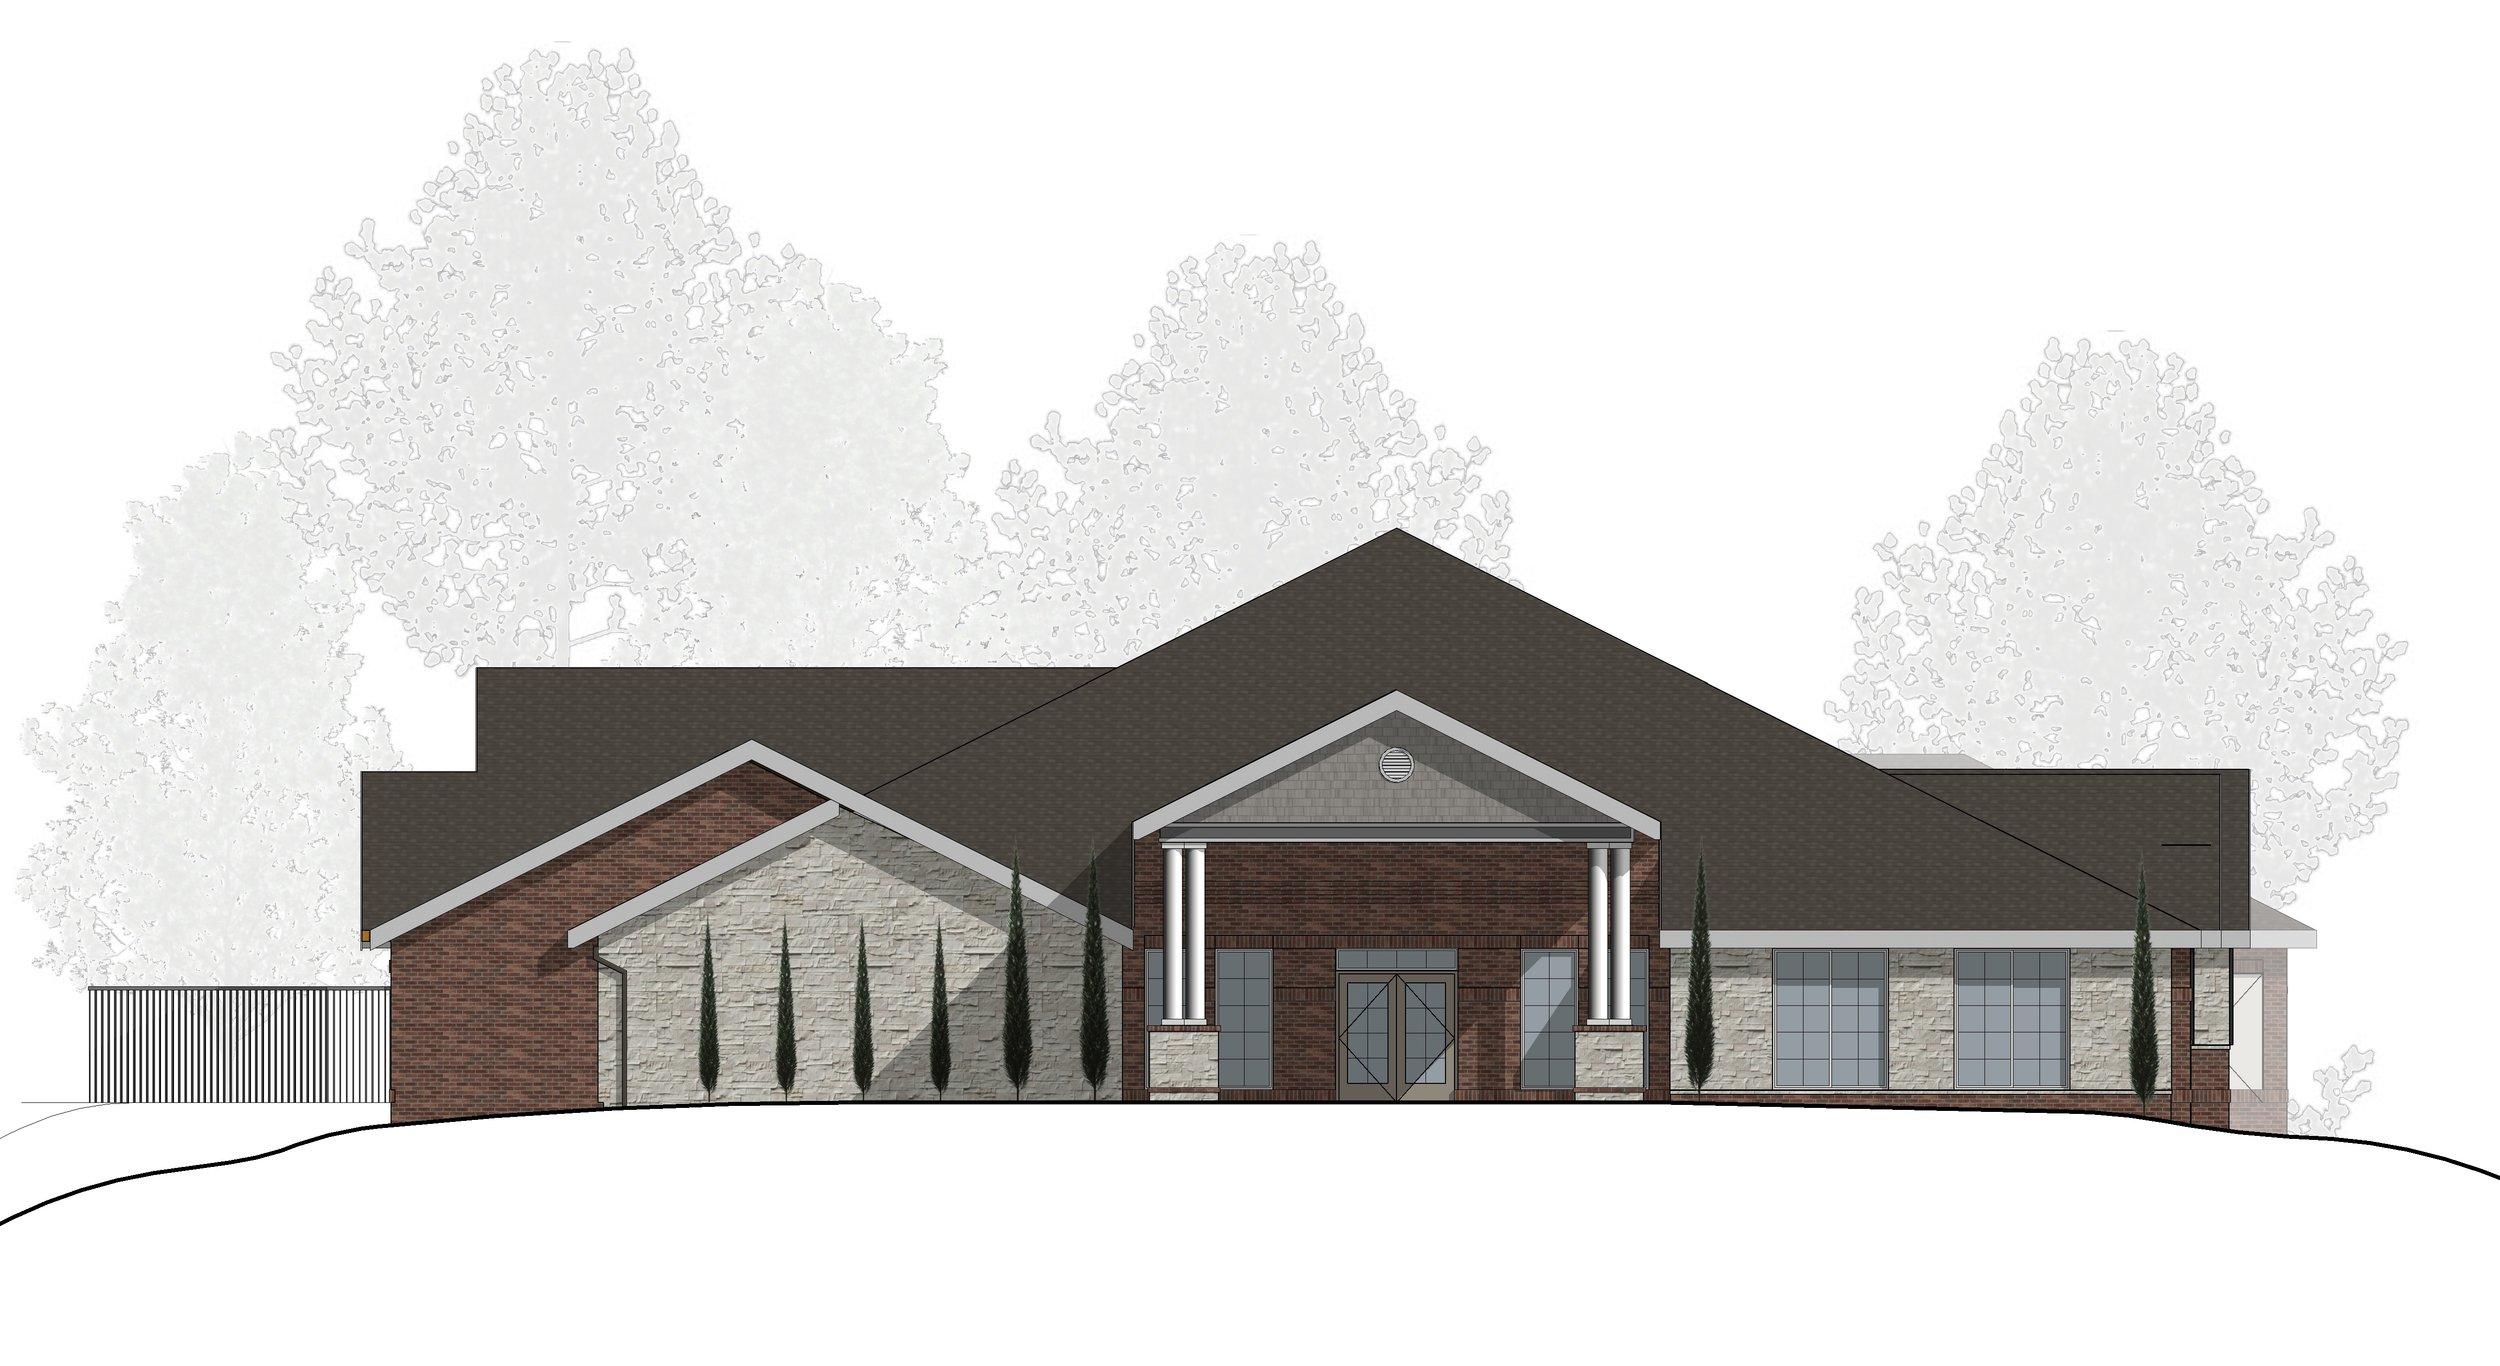 Villas of Jackson Memory Care Front View.jpg